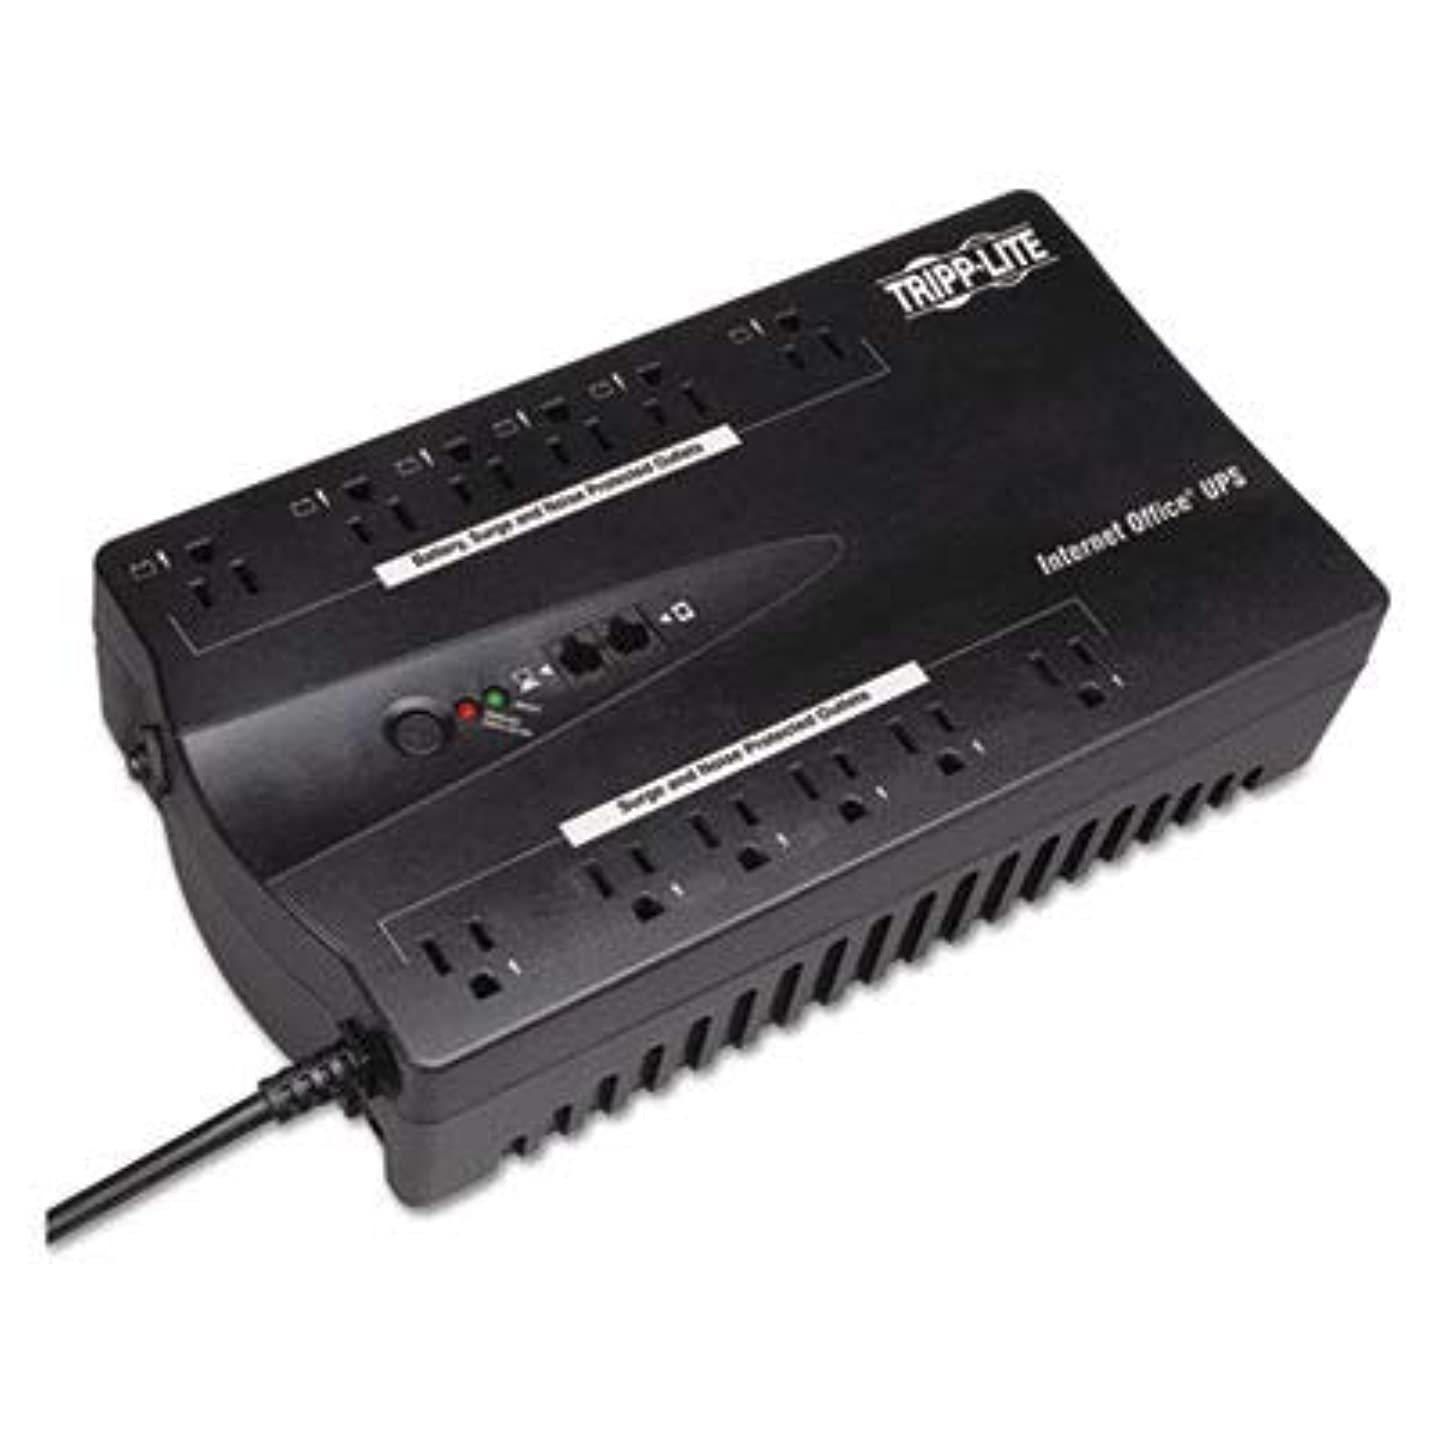 TRPINTERNET900U - Tripp Lite INTERNET900U Internet Office 900VA UPS 120V with USB